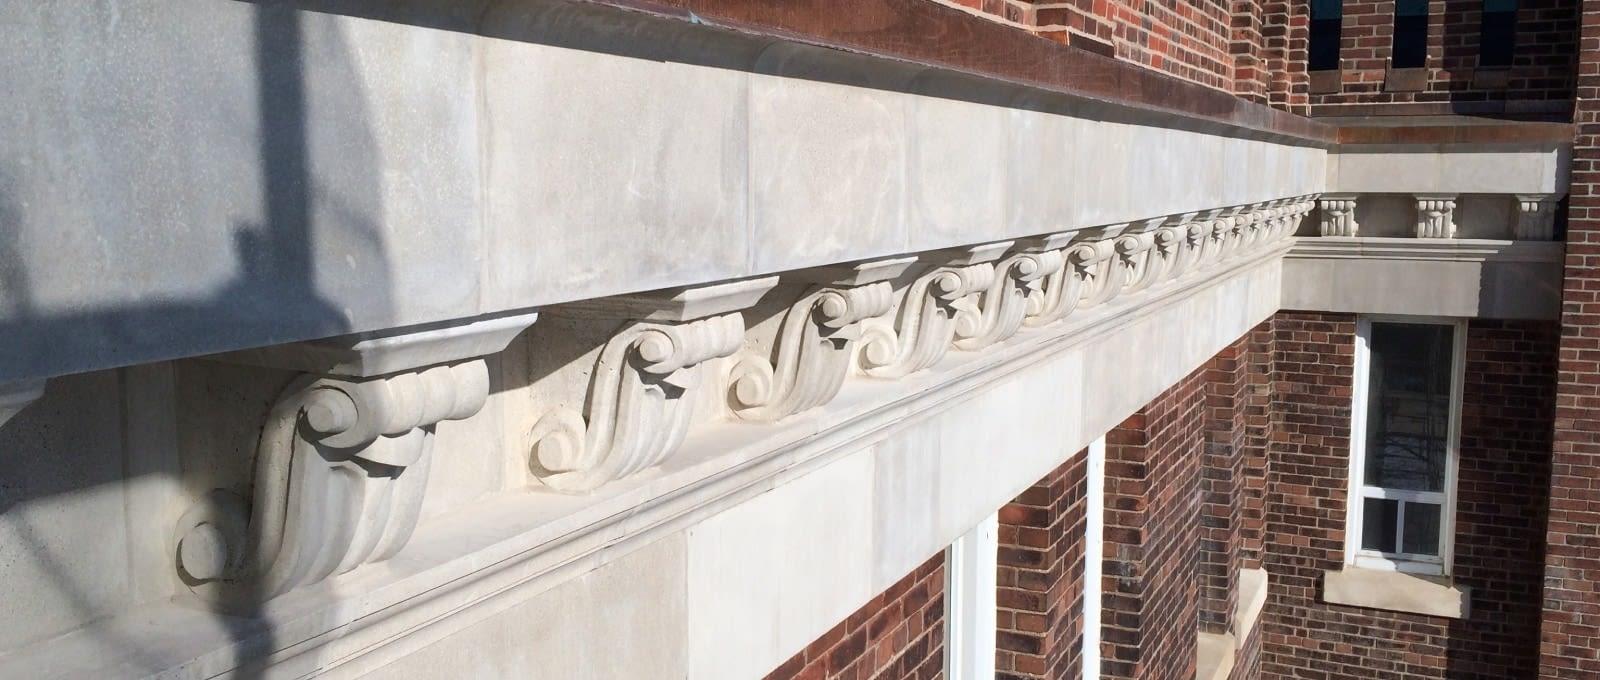 Close-up of detailed masonry restoration at St.Augustine's Seminary in Toronto, Ontario